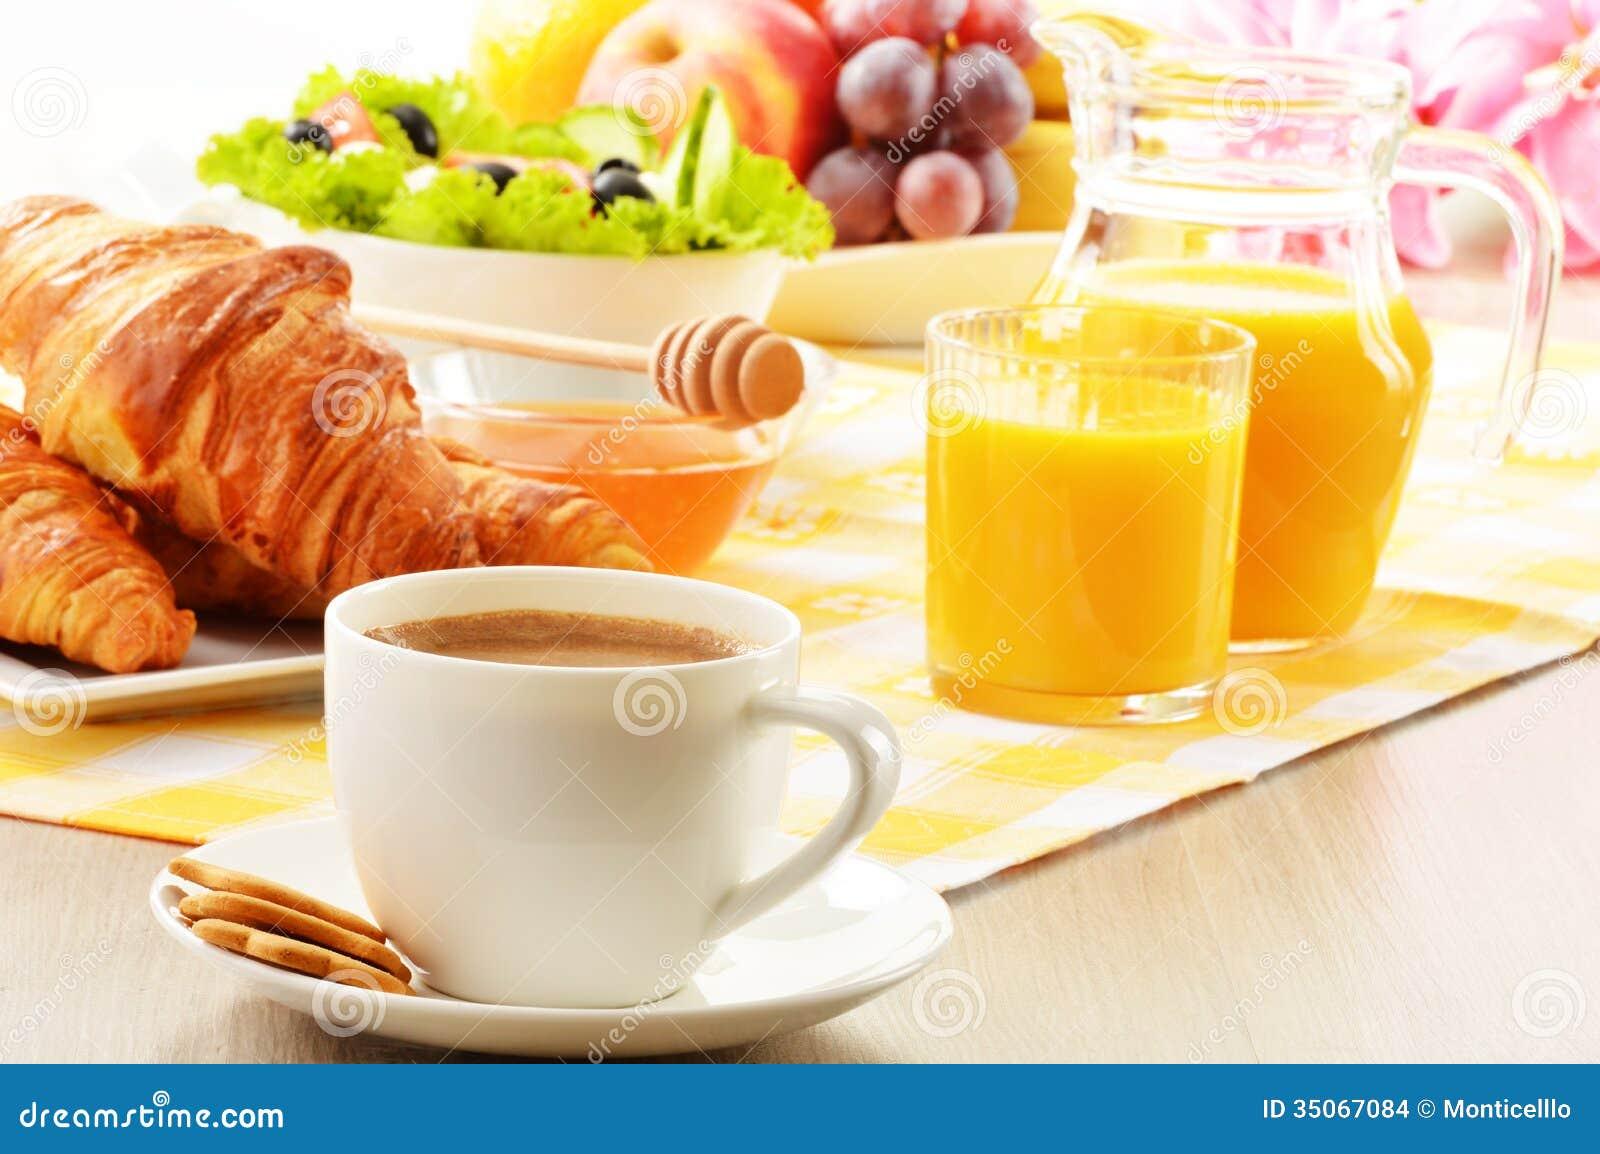 Breakfast With Coffee Orange Juice Croissant Egg